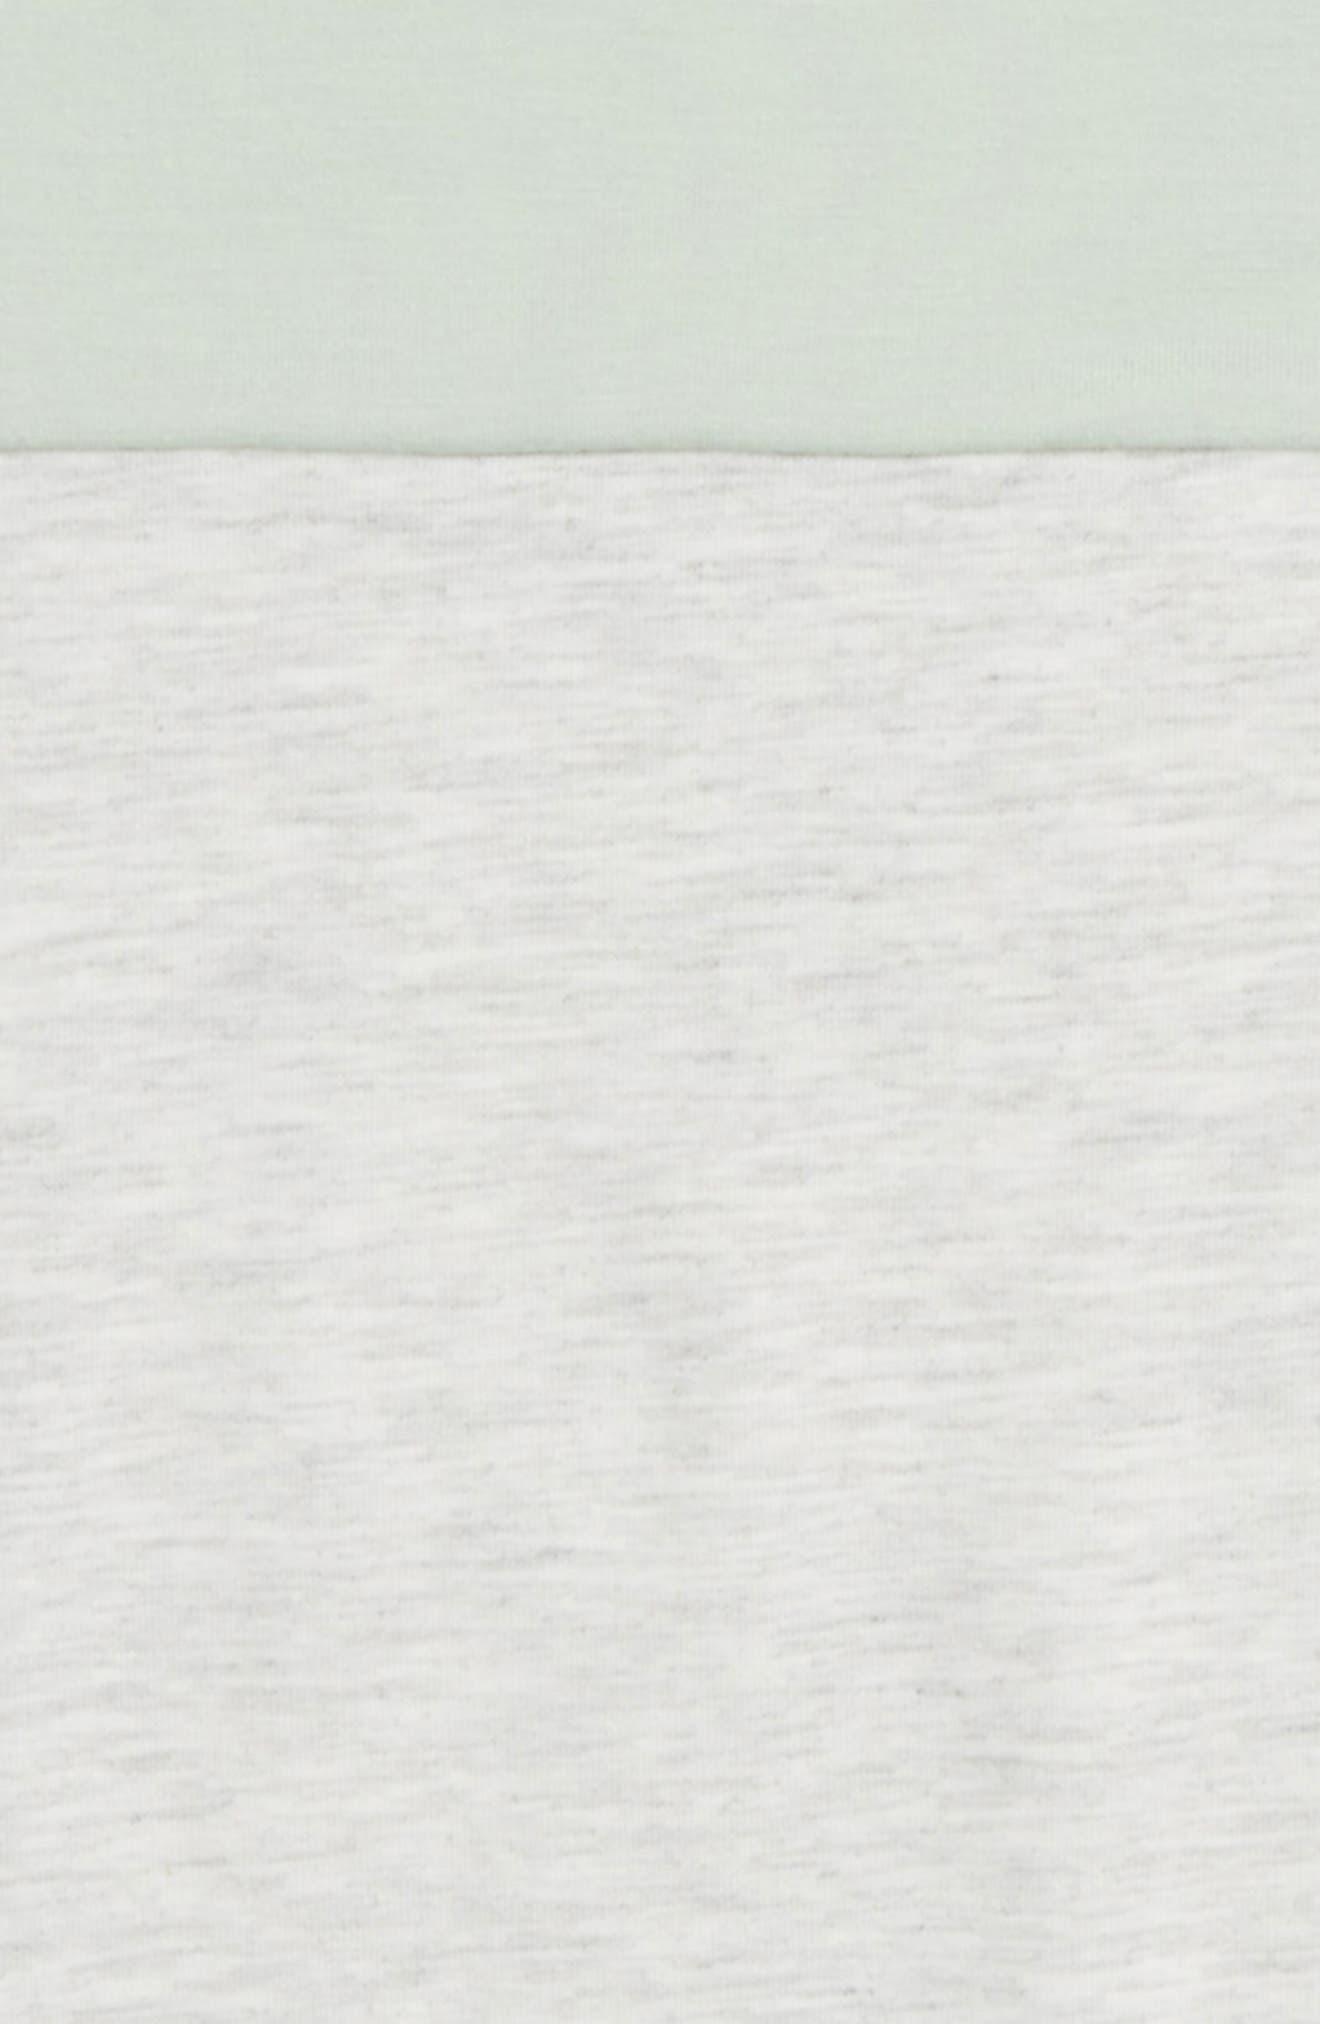 Colorblock Tee,                             Alternate thumbnail 2, color,                             White/ Mint